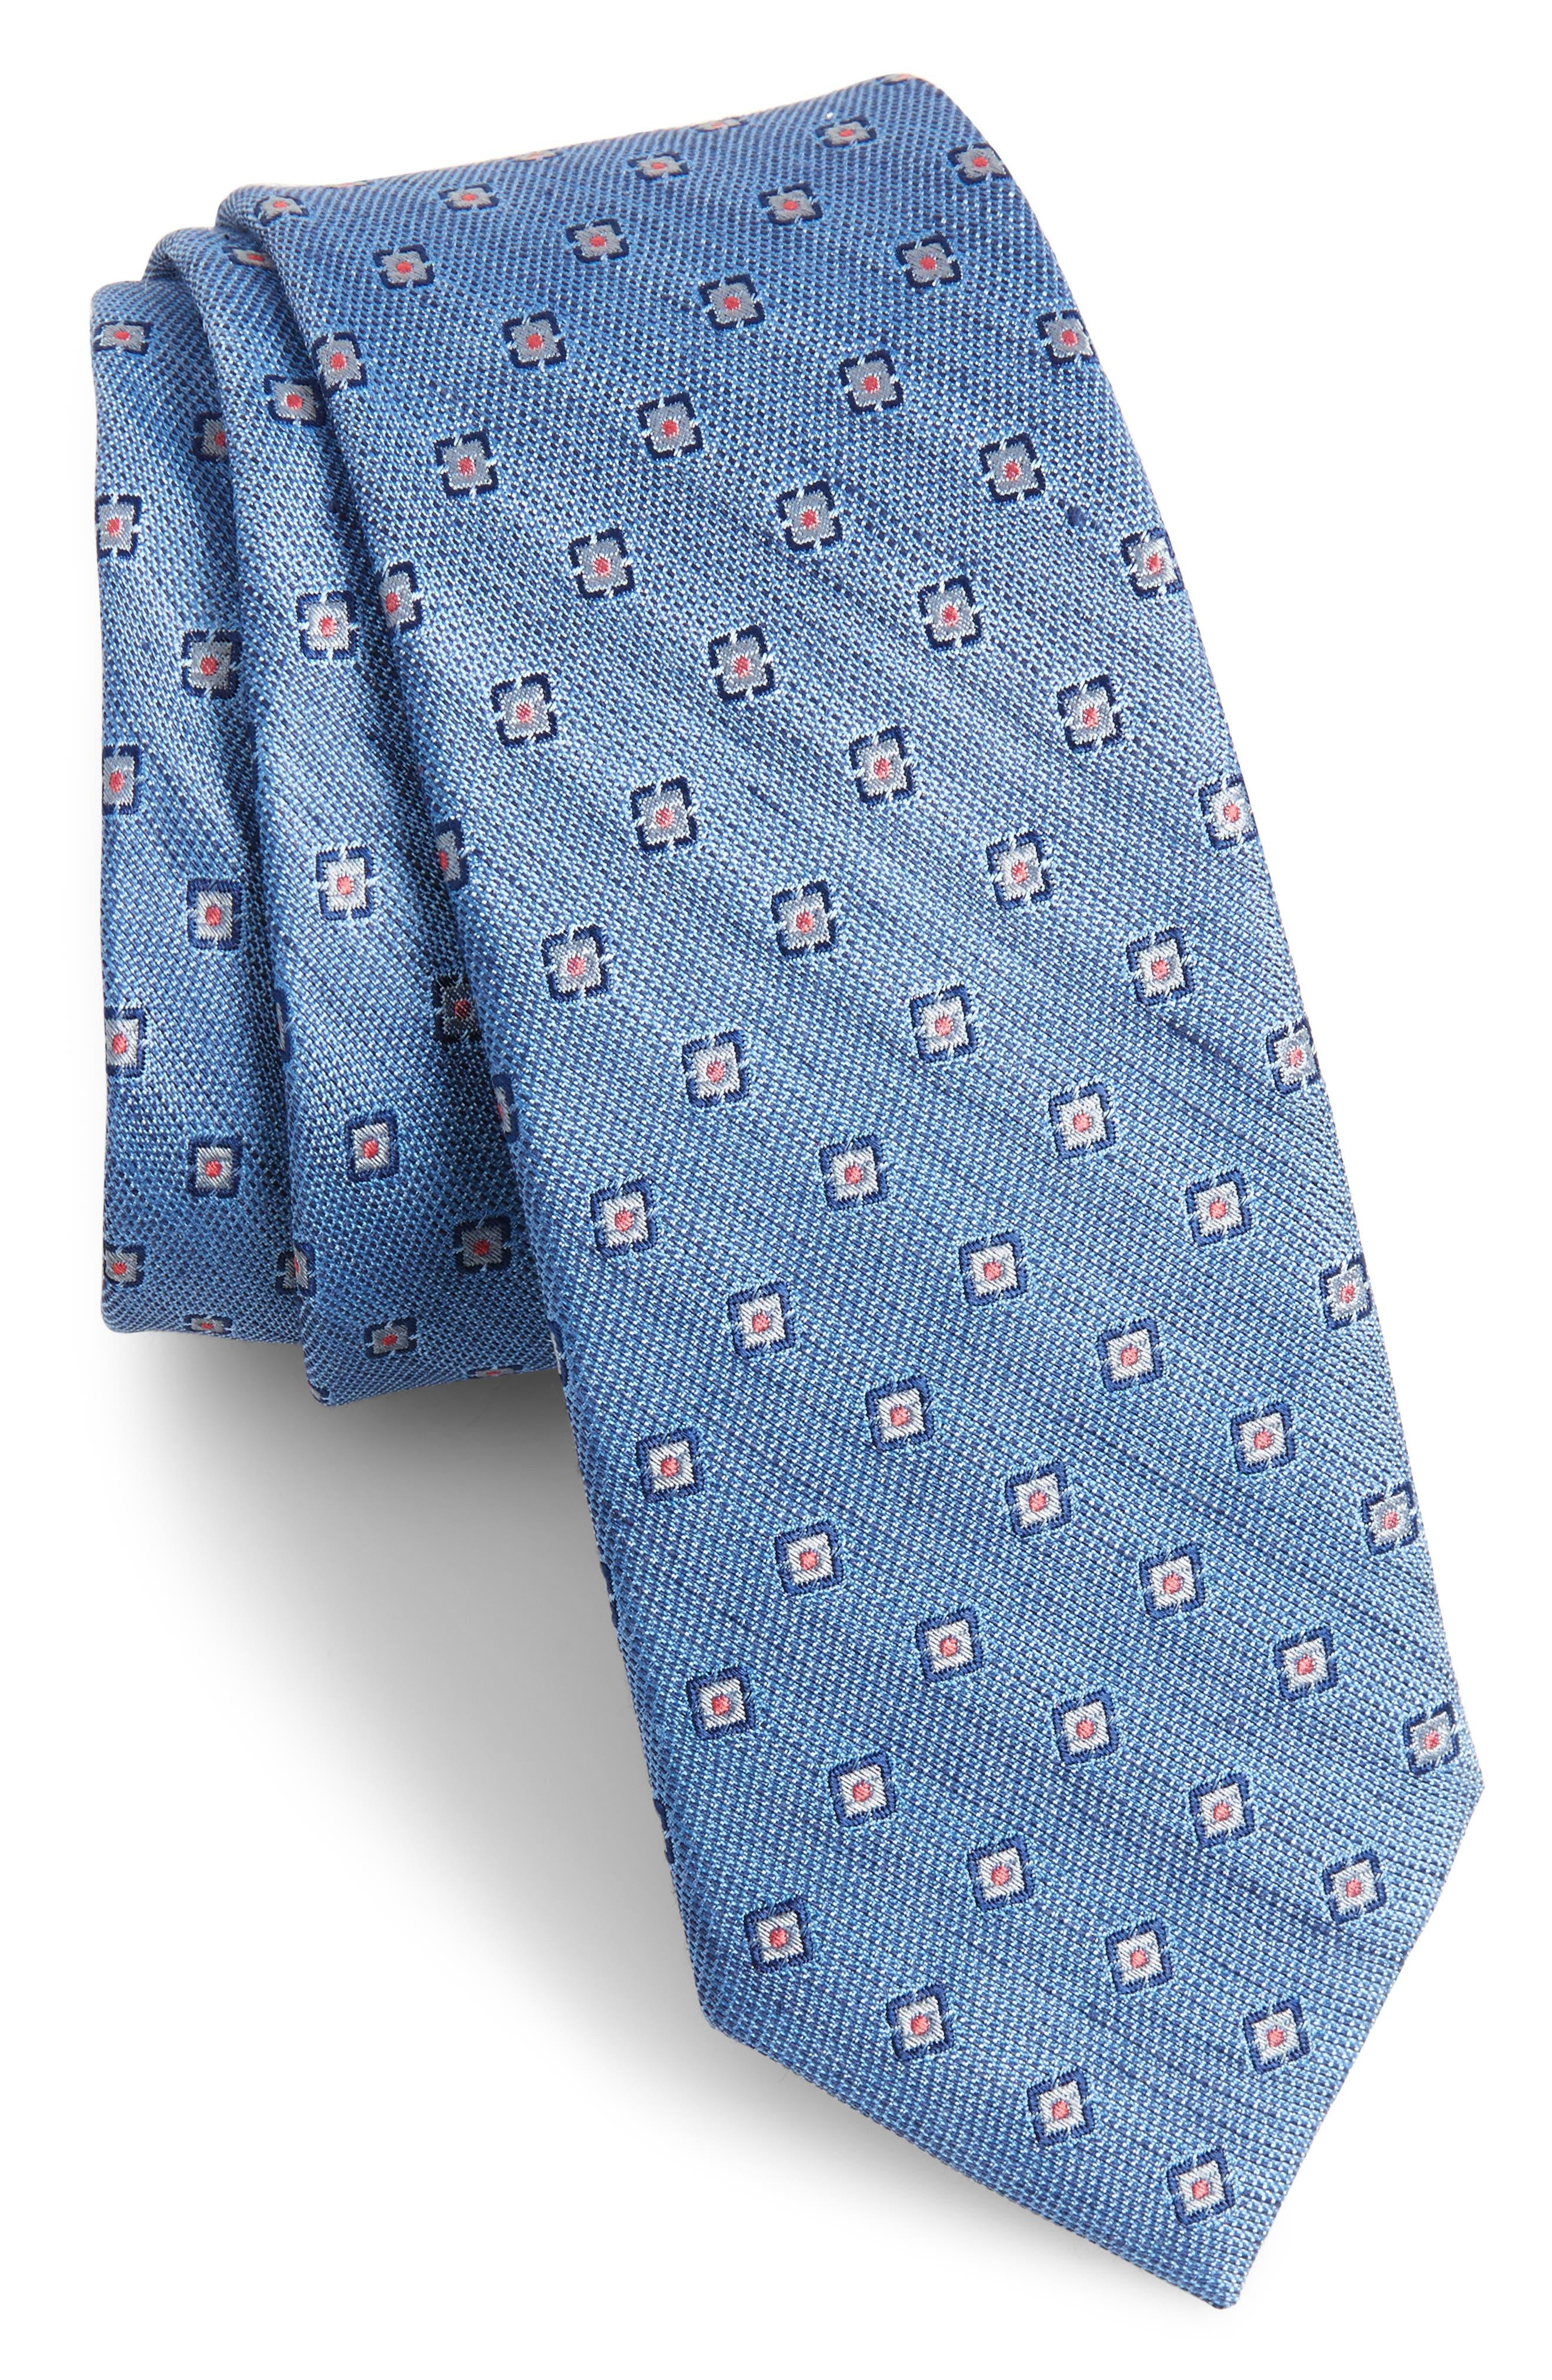 Main Image - The Tie Bar Medallion Scene Silk & Linen Skinny Tie